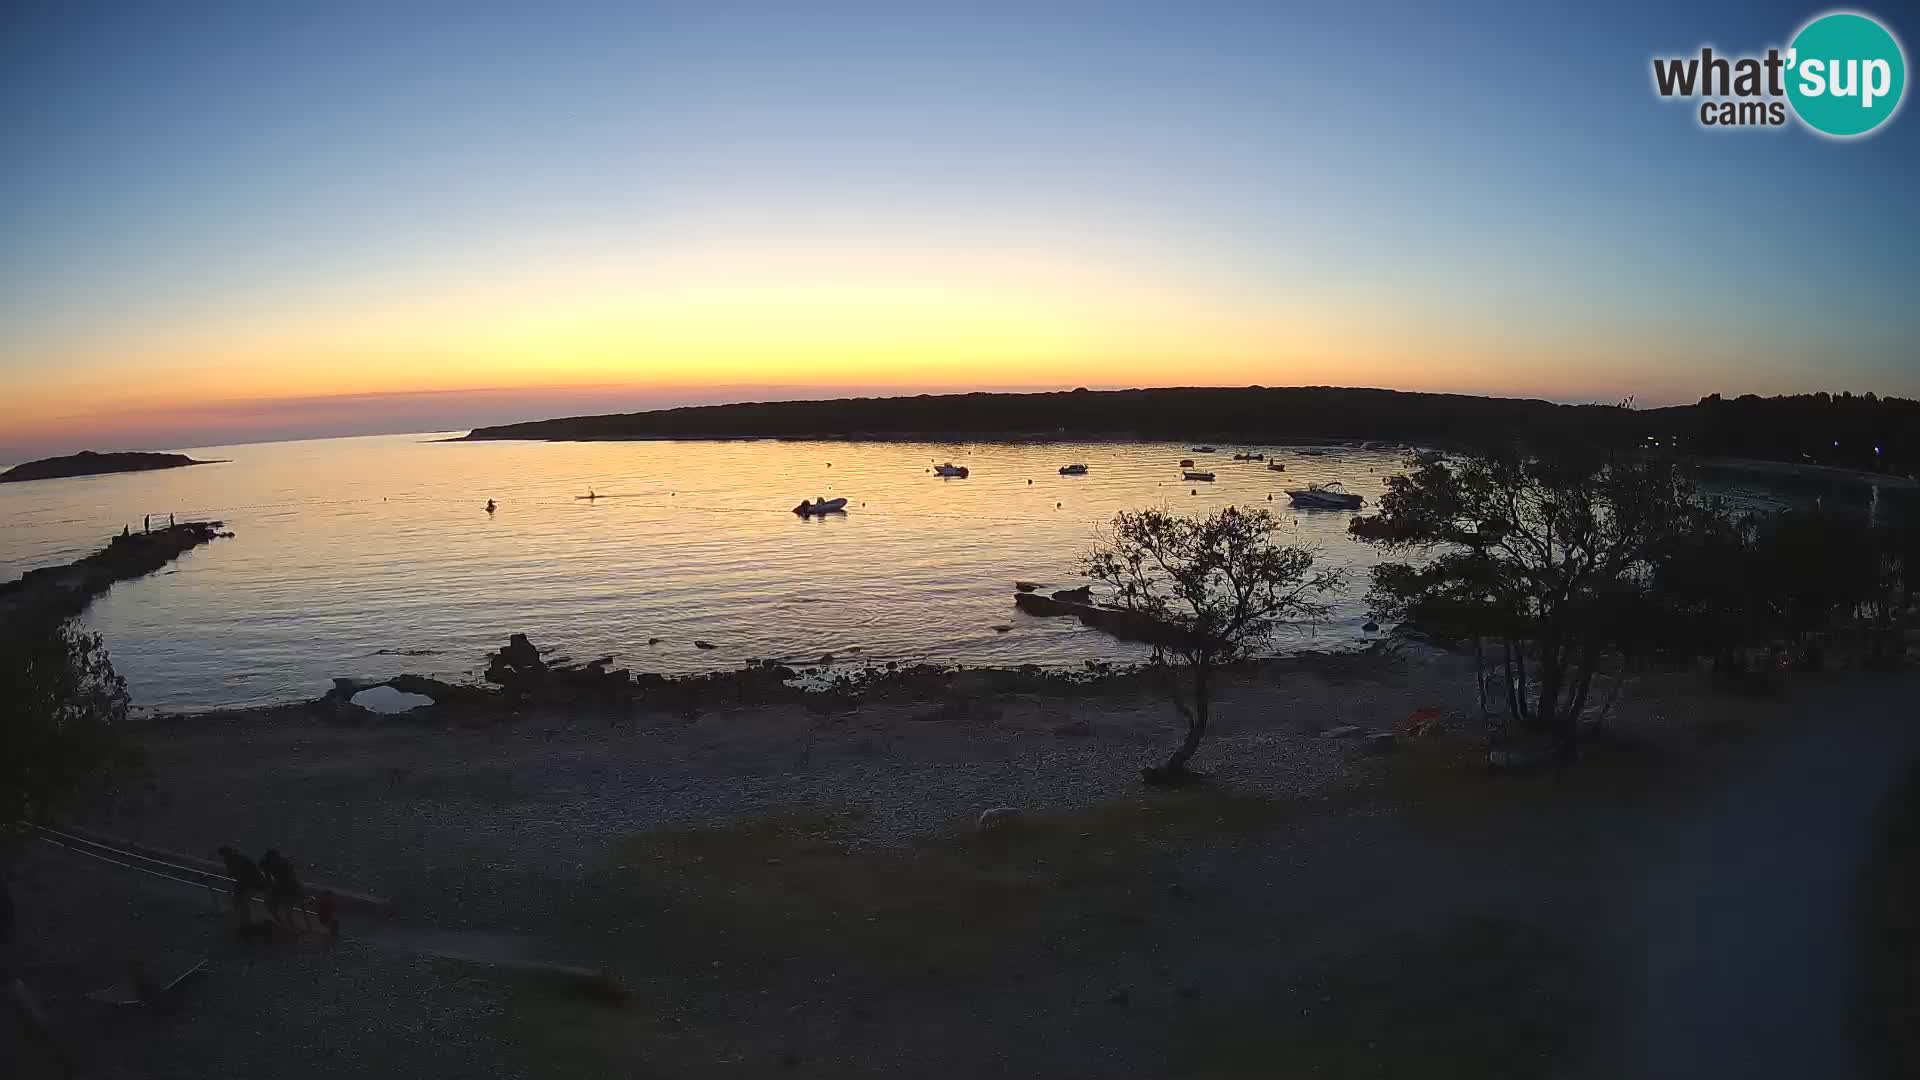 Bale – Kamp Mon Perin